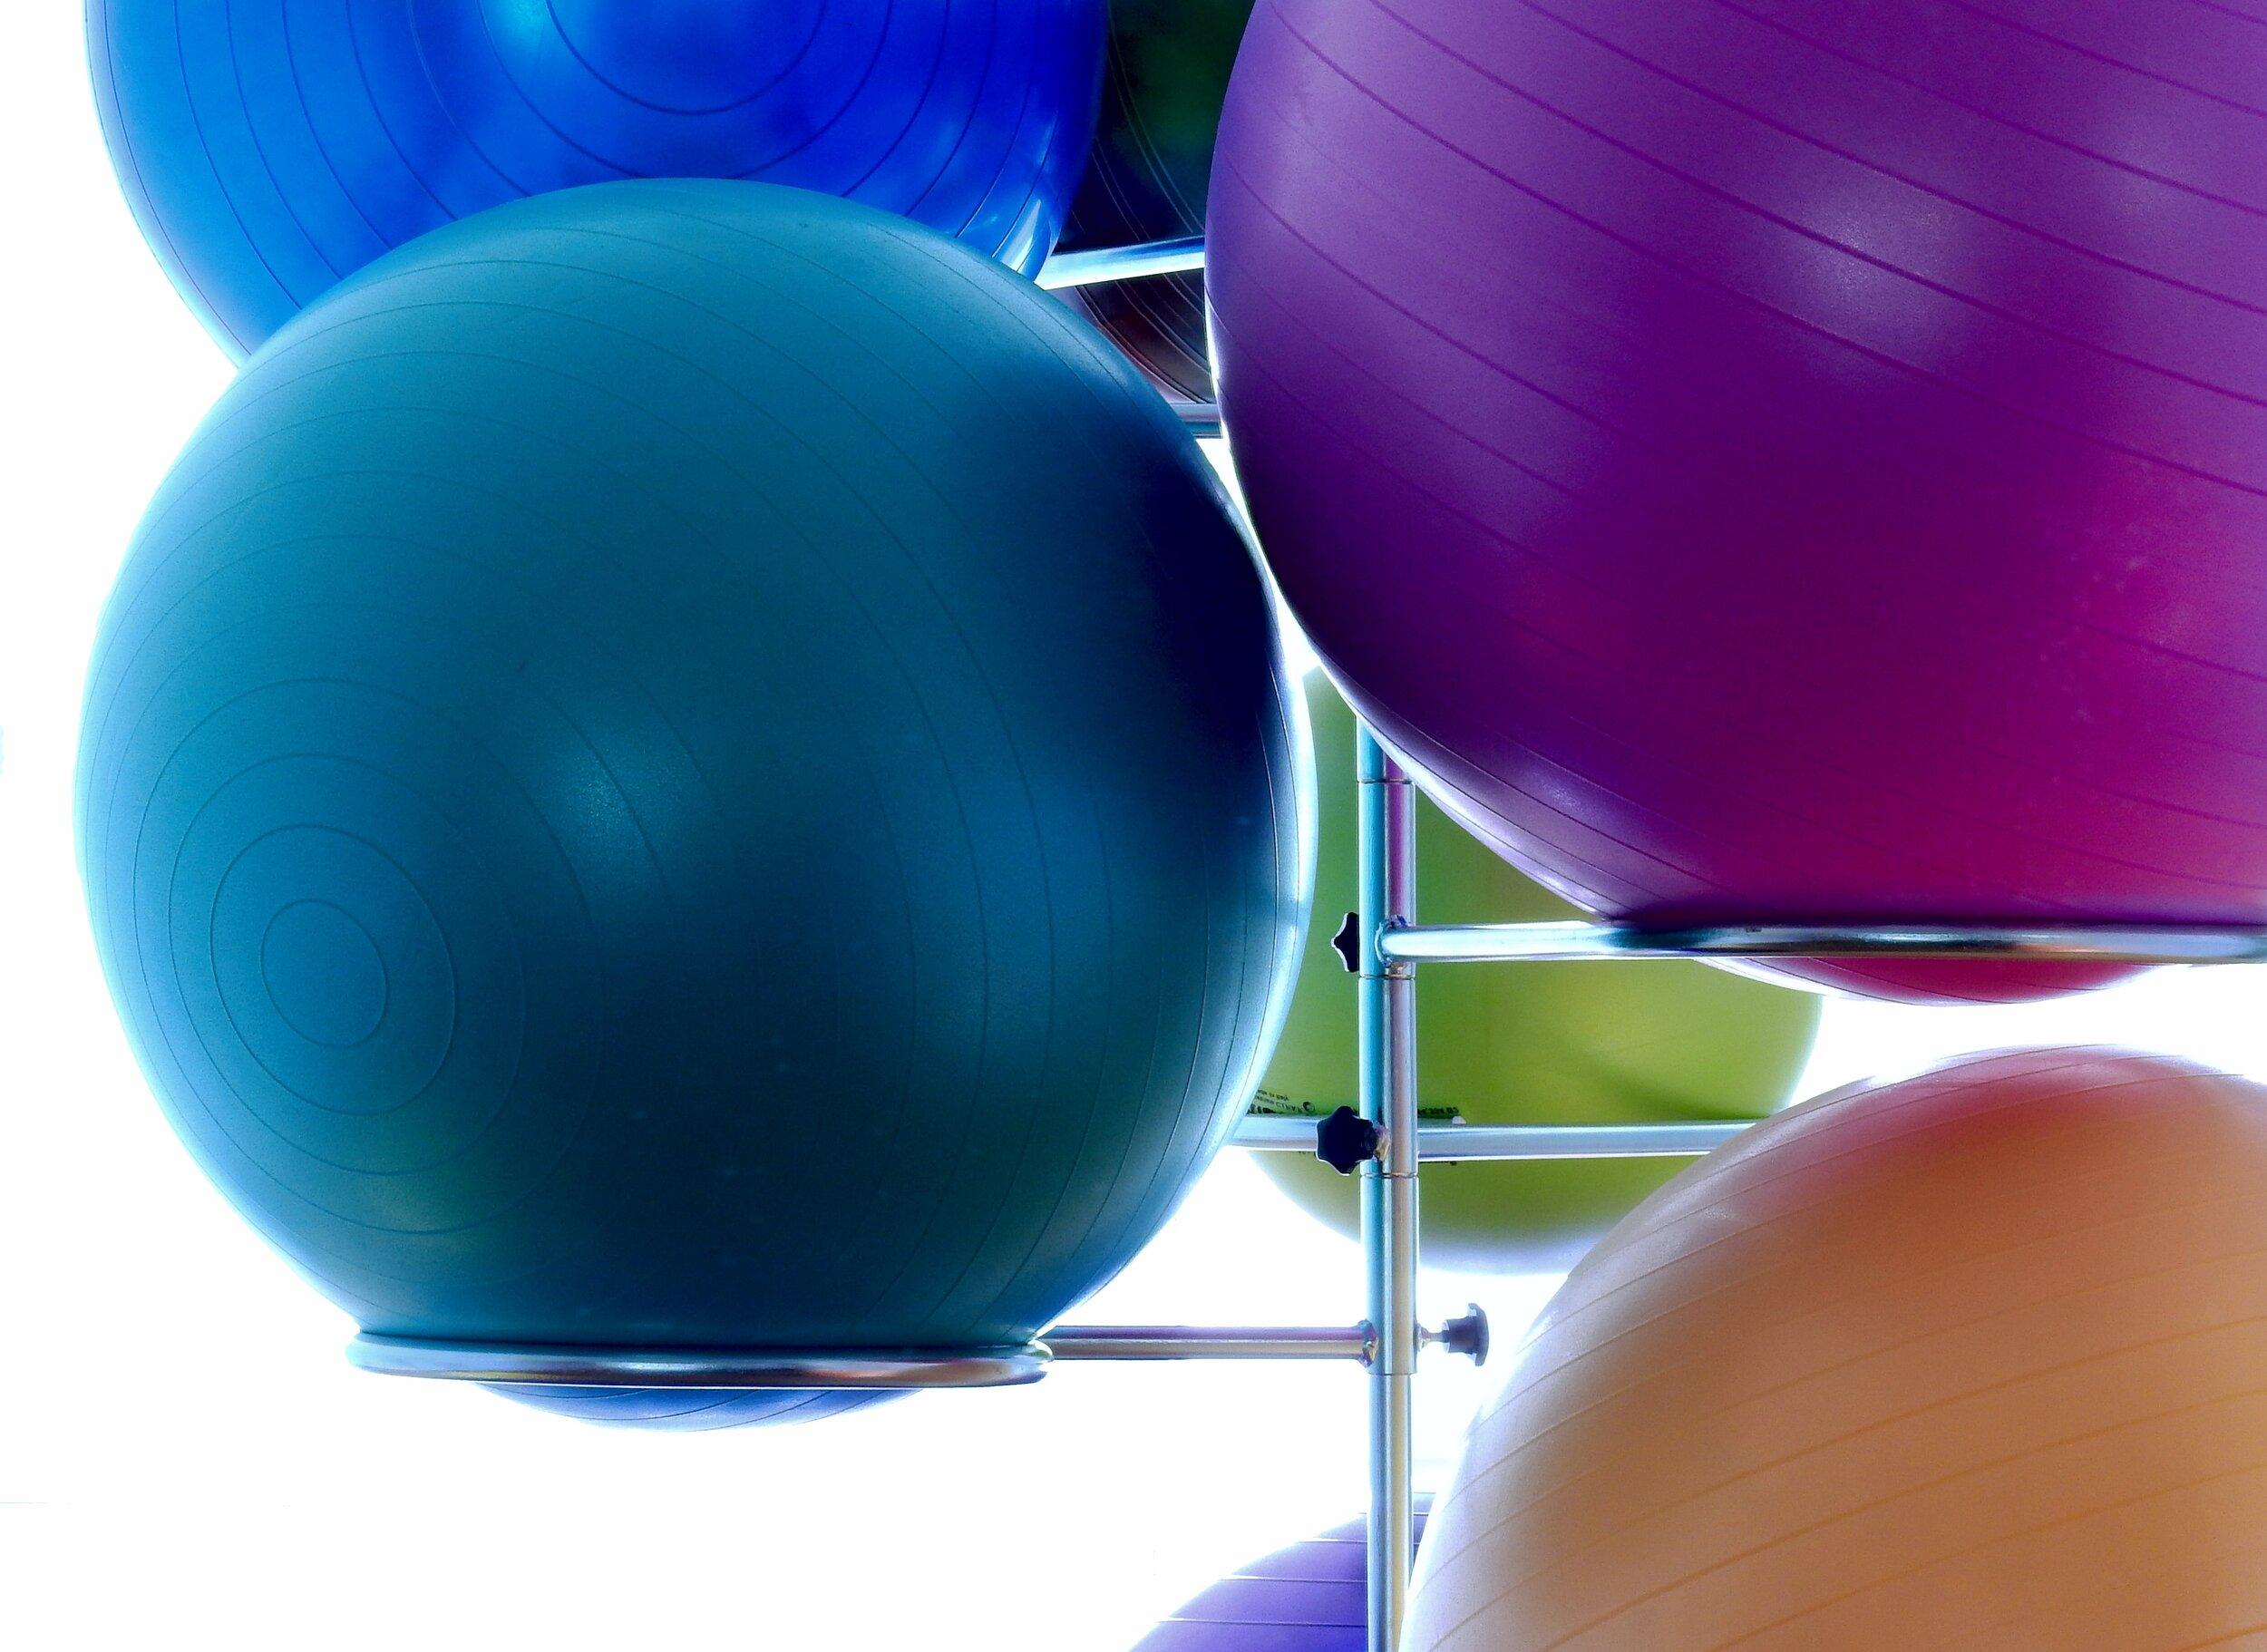 art-balloon-balls-159638.jpg